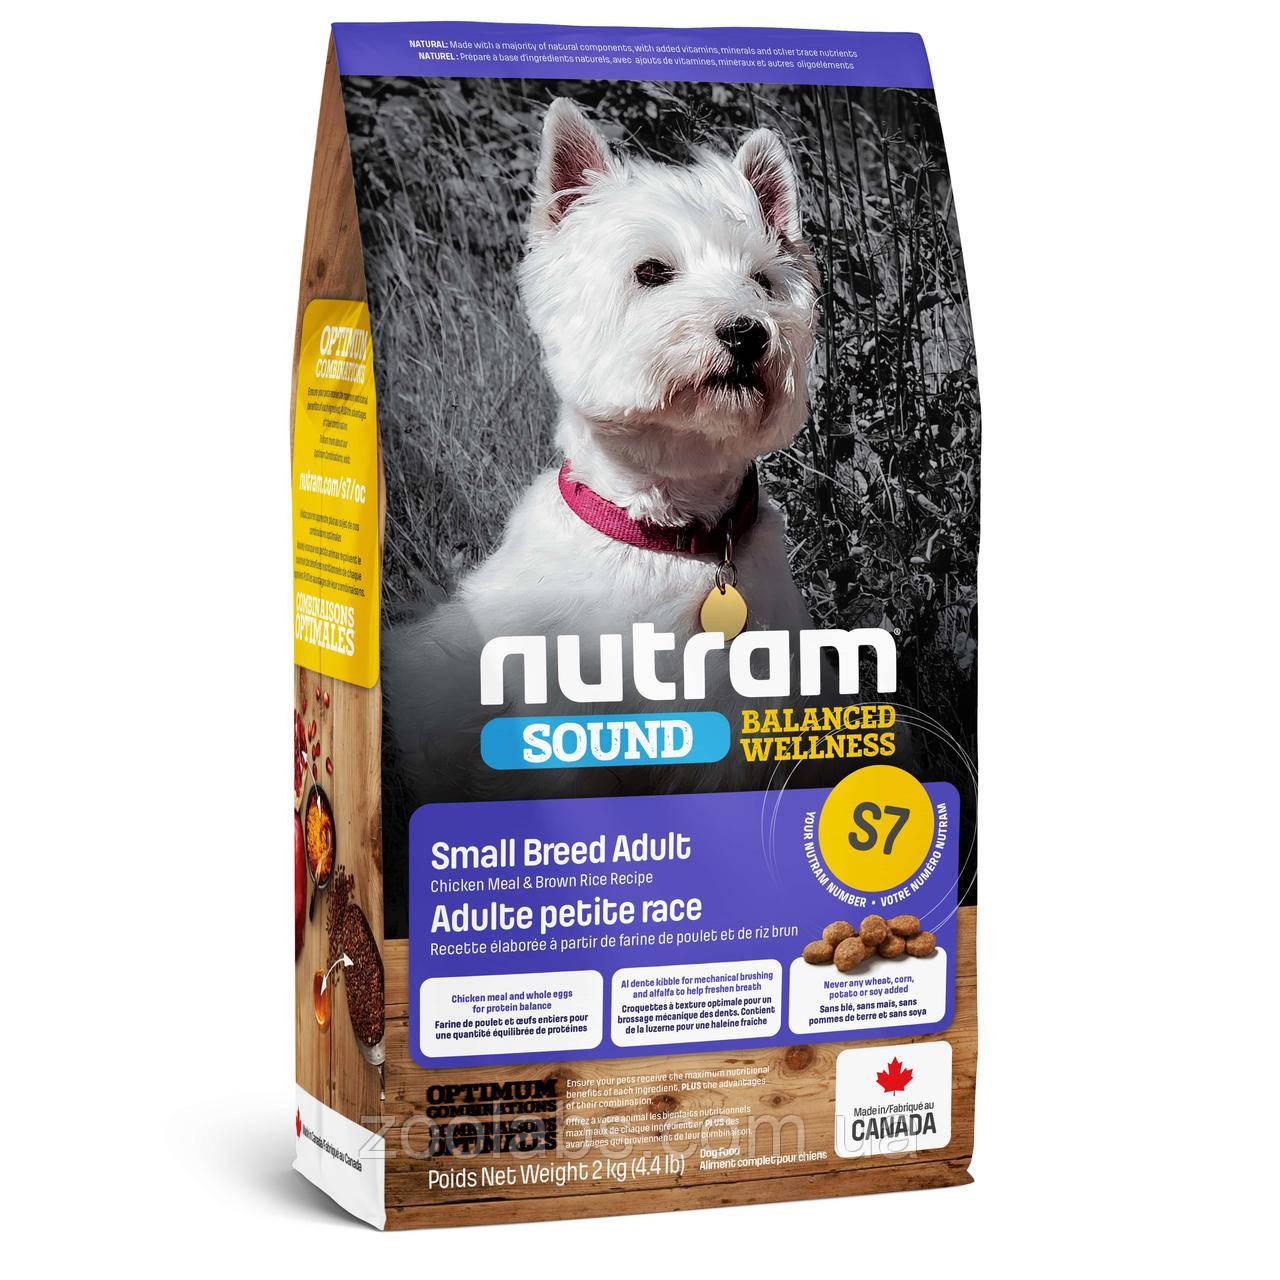 Корм Nutram для собак мелких пород | Nutram S7 Sound Balanced Wellness Small Breed Adult Dog 5,4 кг